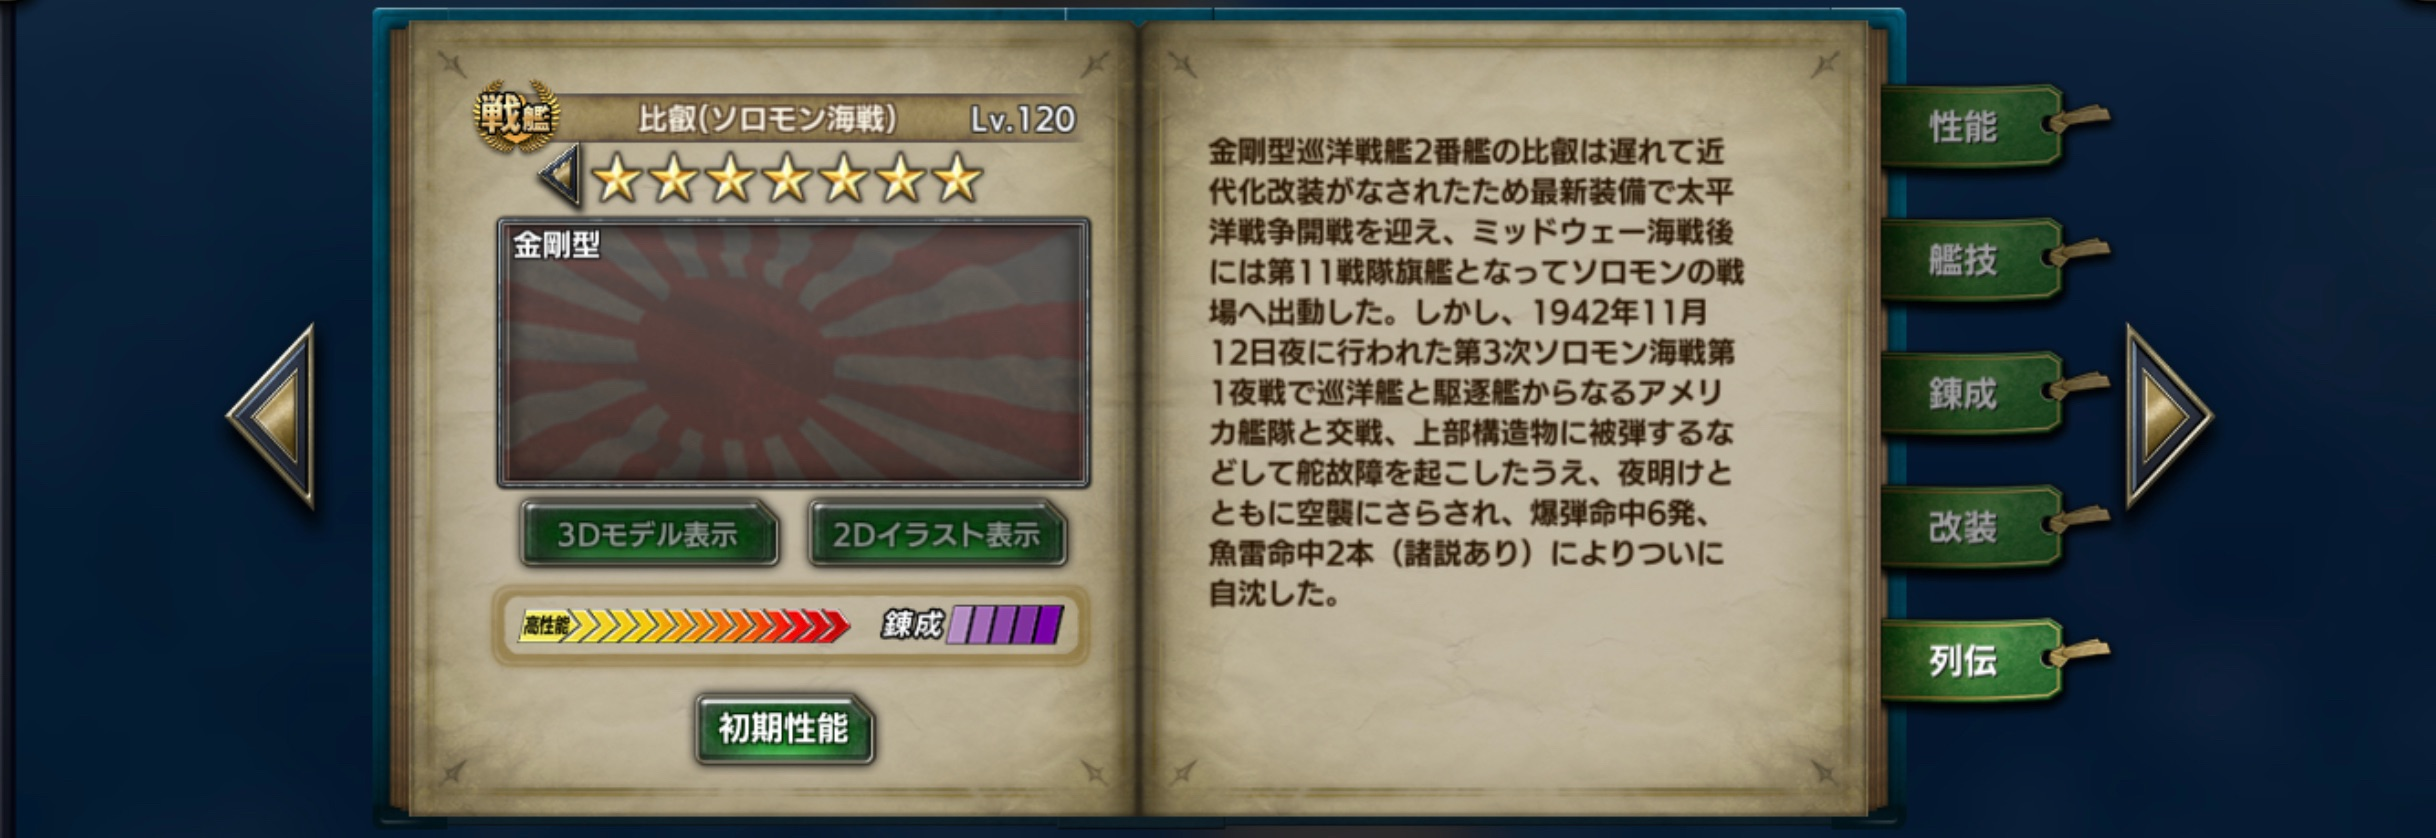 HieiS-history